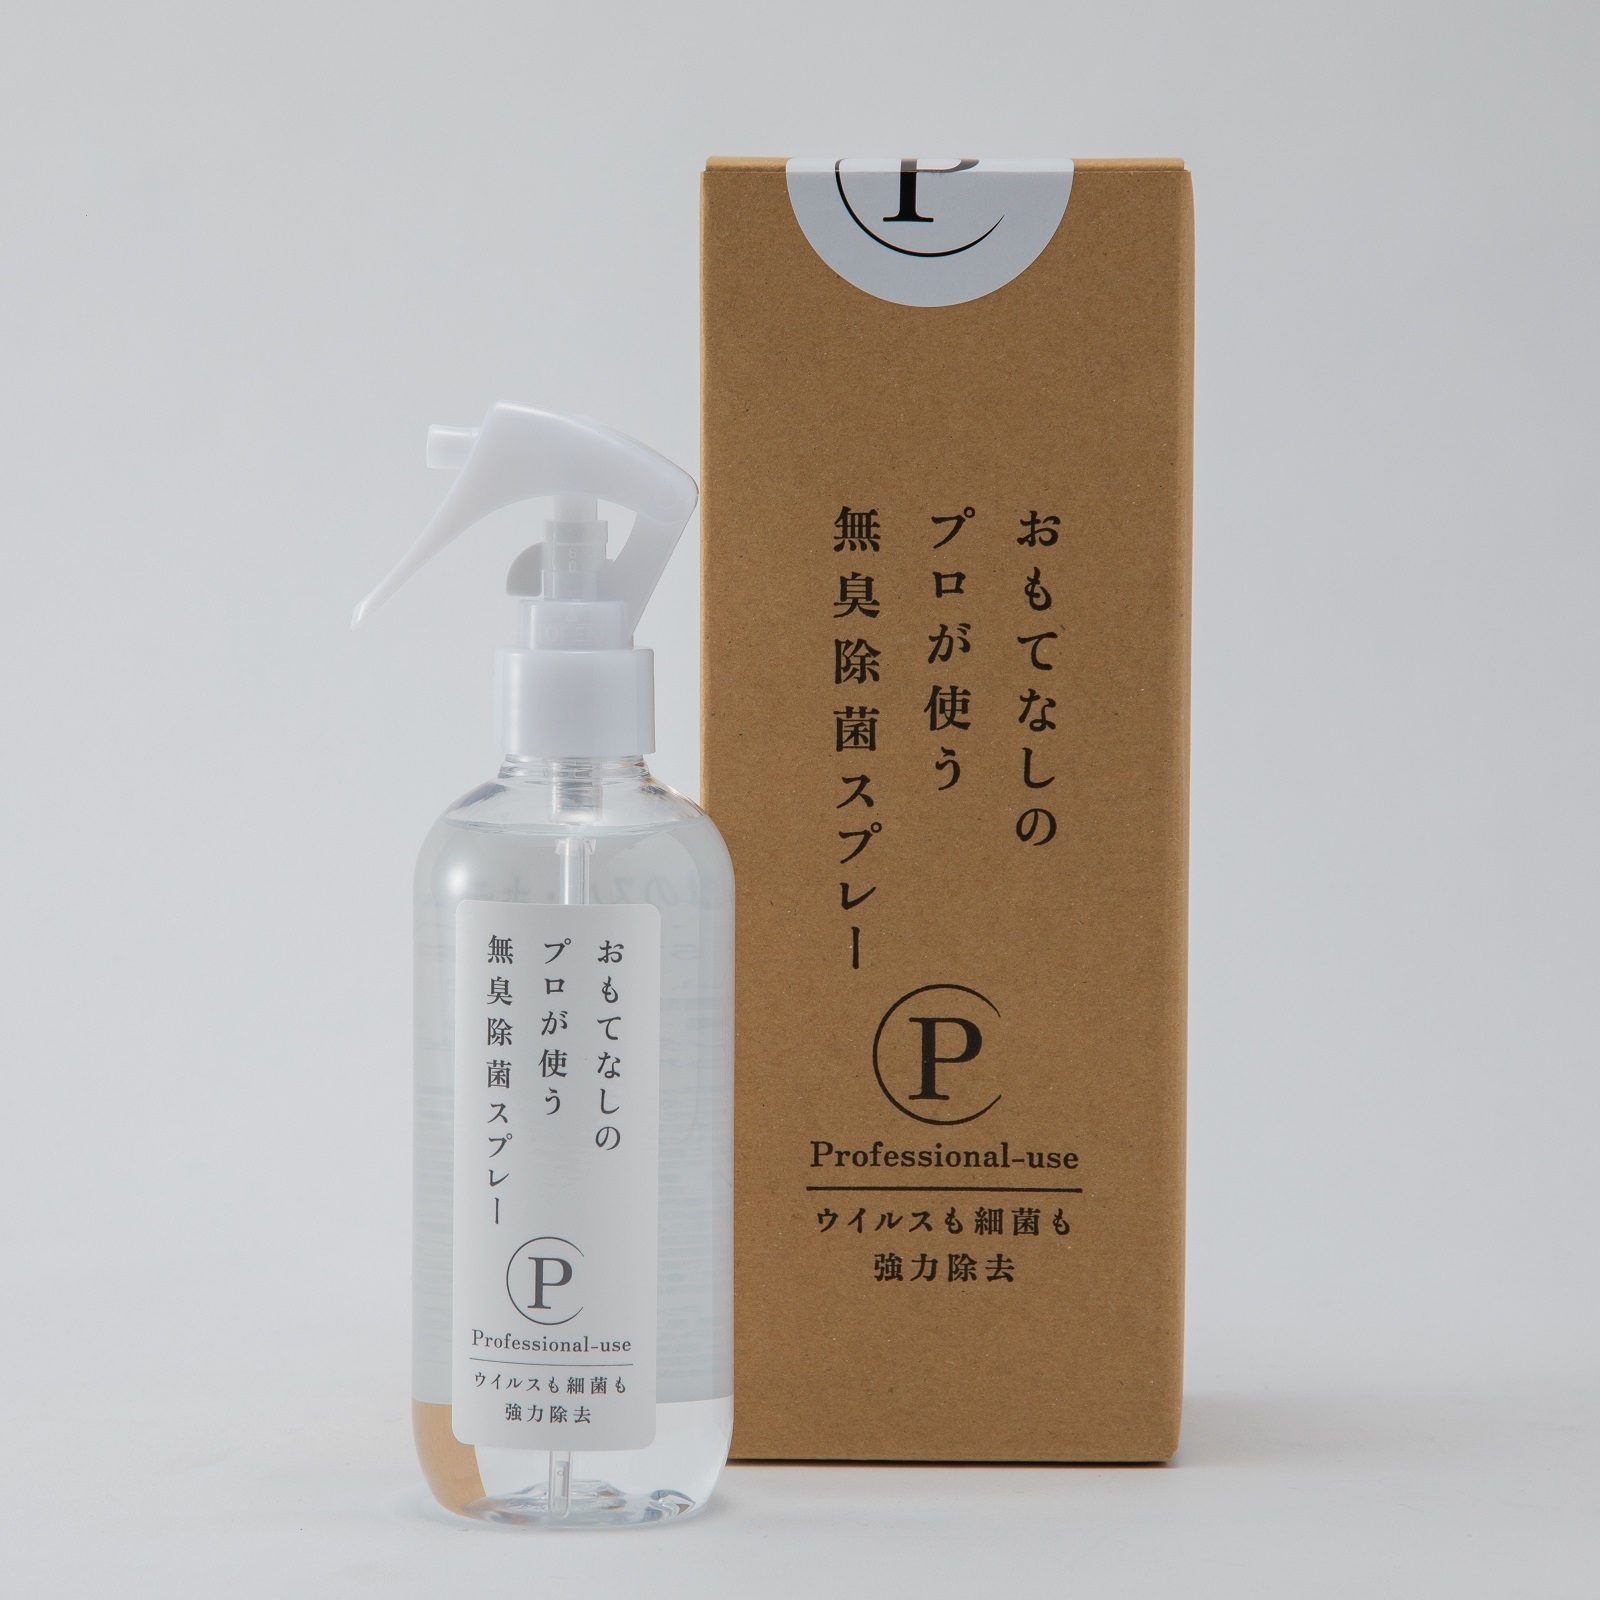 Pシリーズ おもてなしのプロが使う無臭除菌スプレー 250ml